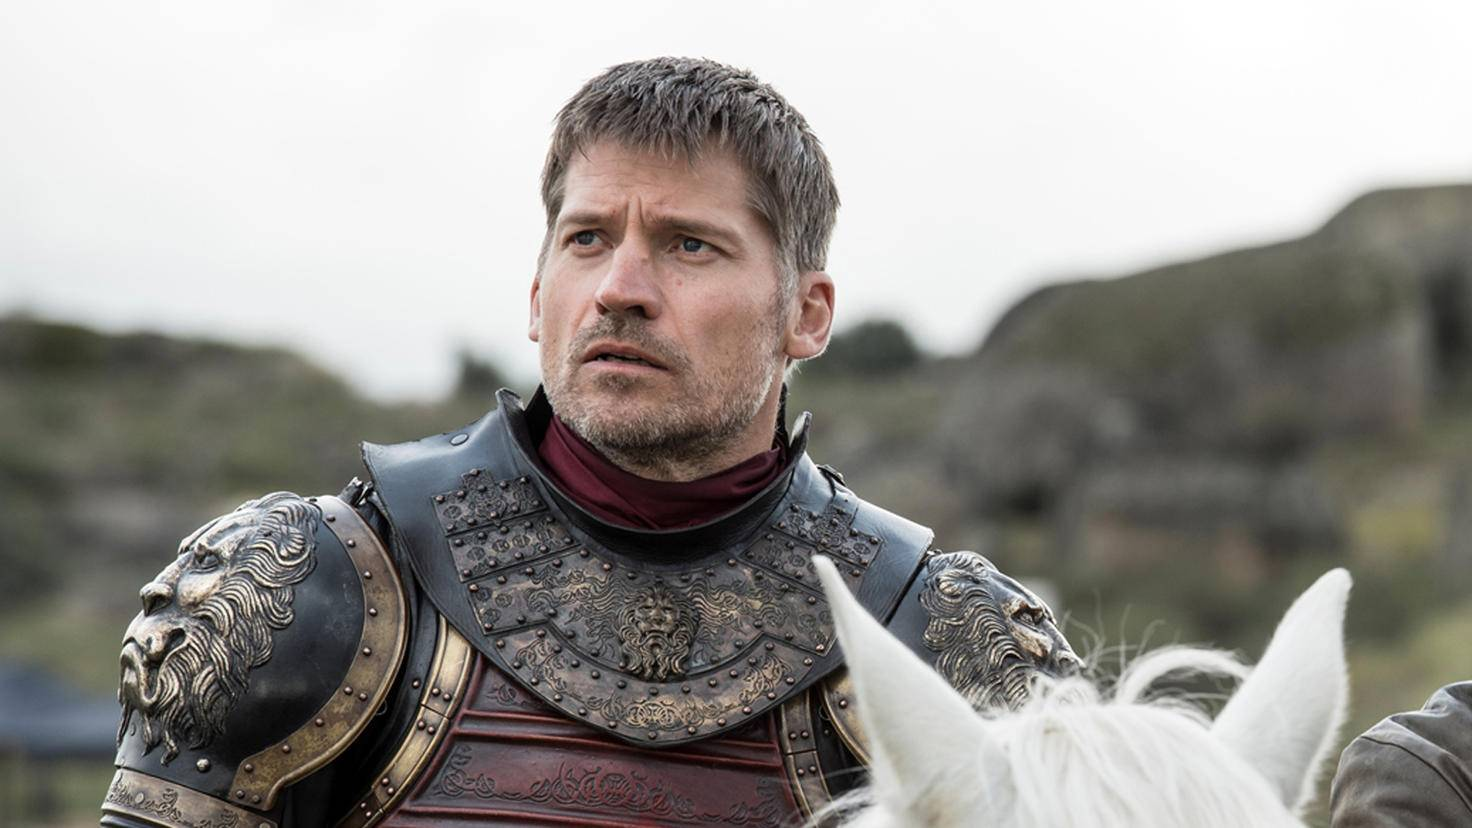 Game of Thrones jaime lannister Nikolaj Coster-Waldau